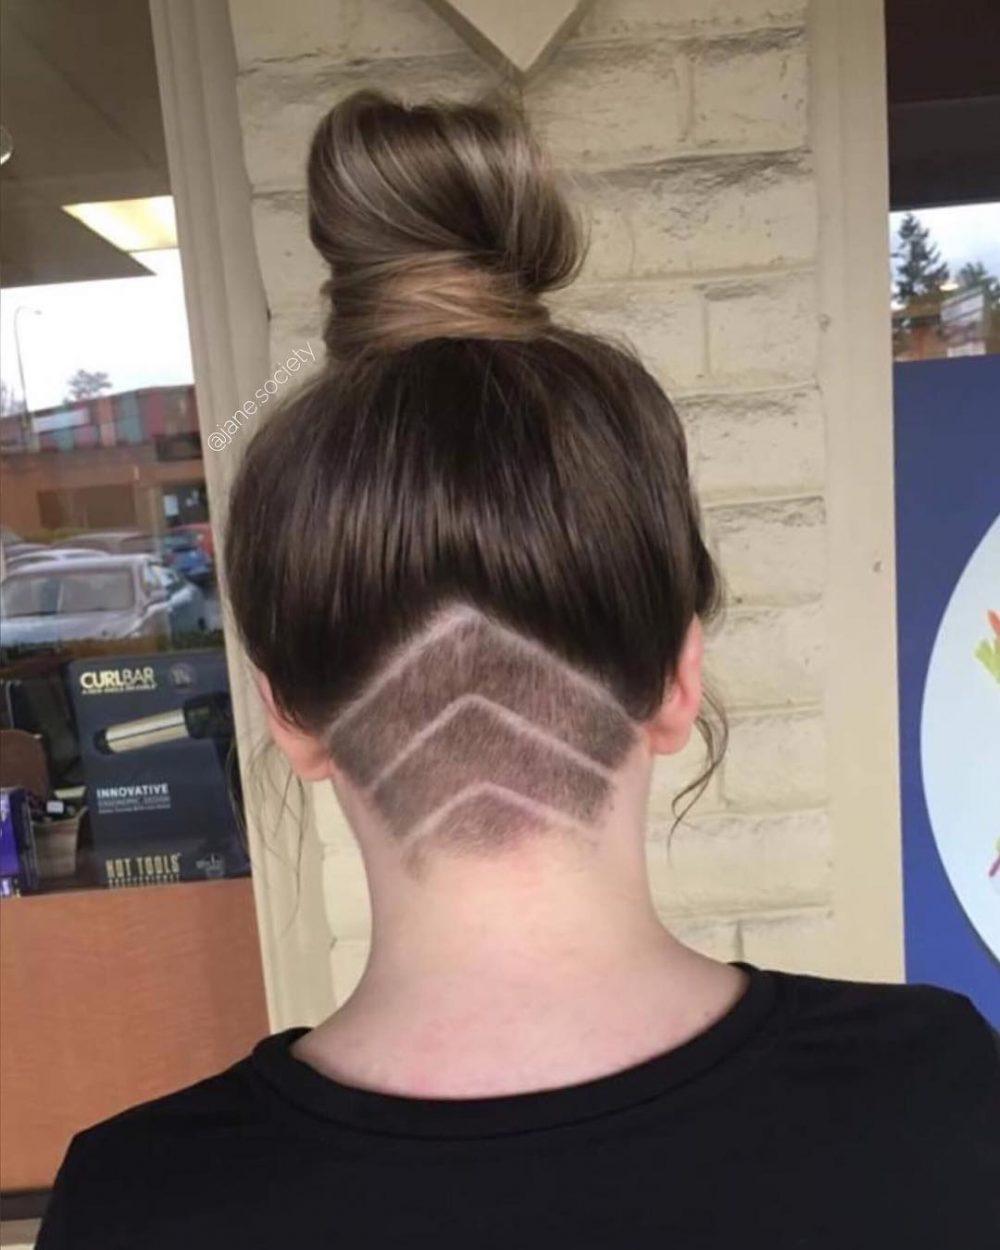 Head Turning Undercut hairstyle